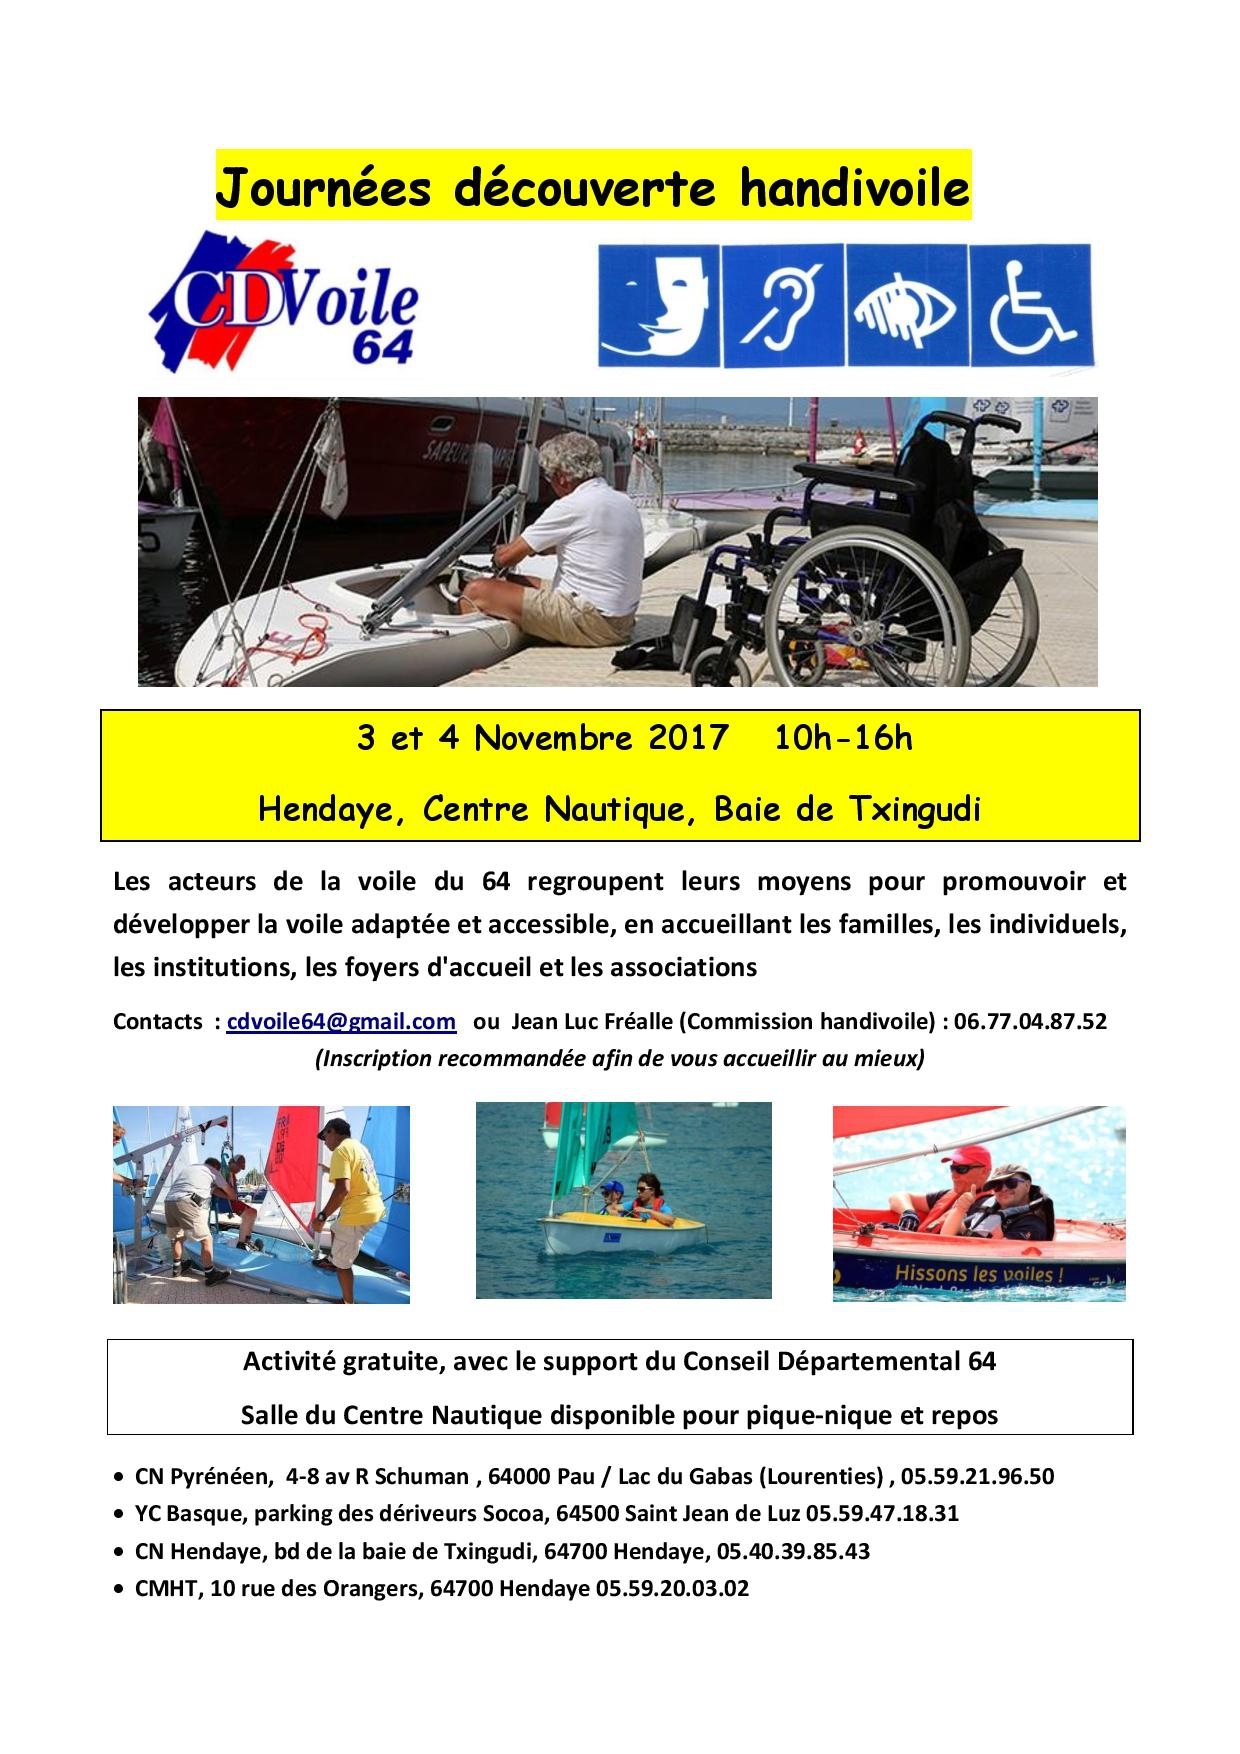 info journées handi CDV64 3-4 nov 2017 image.jpg